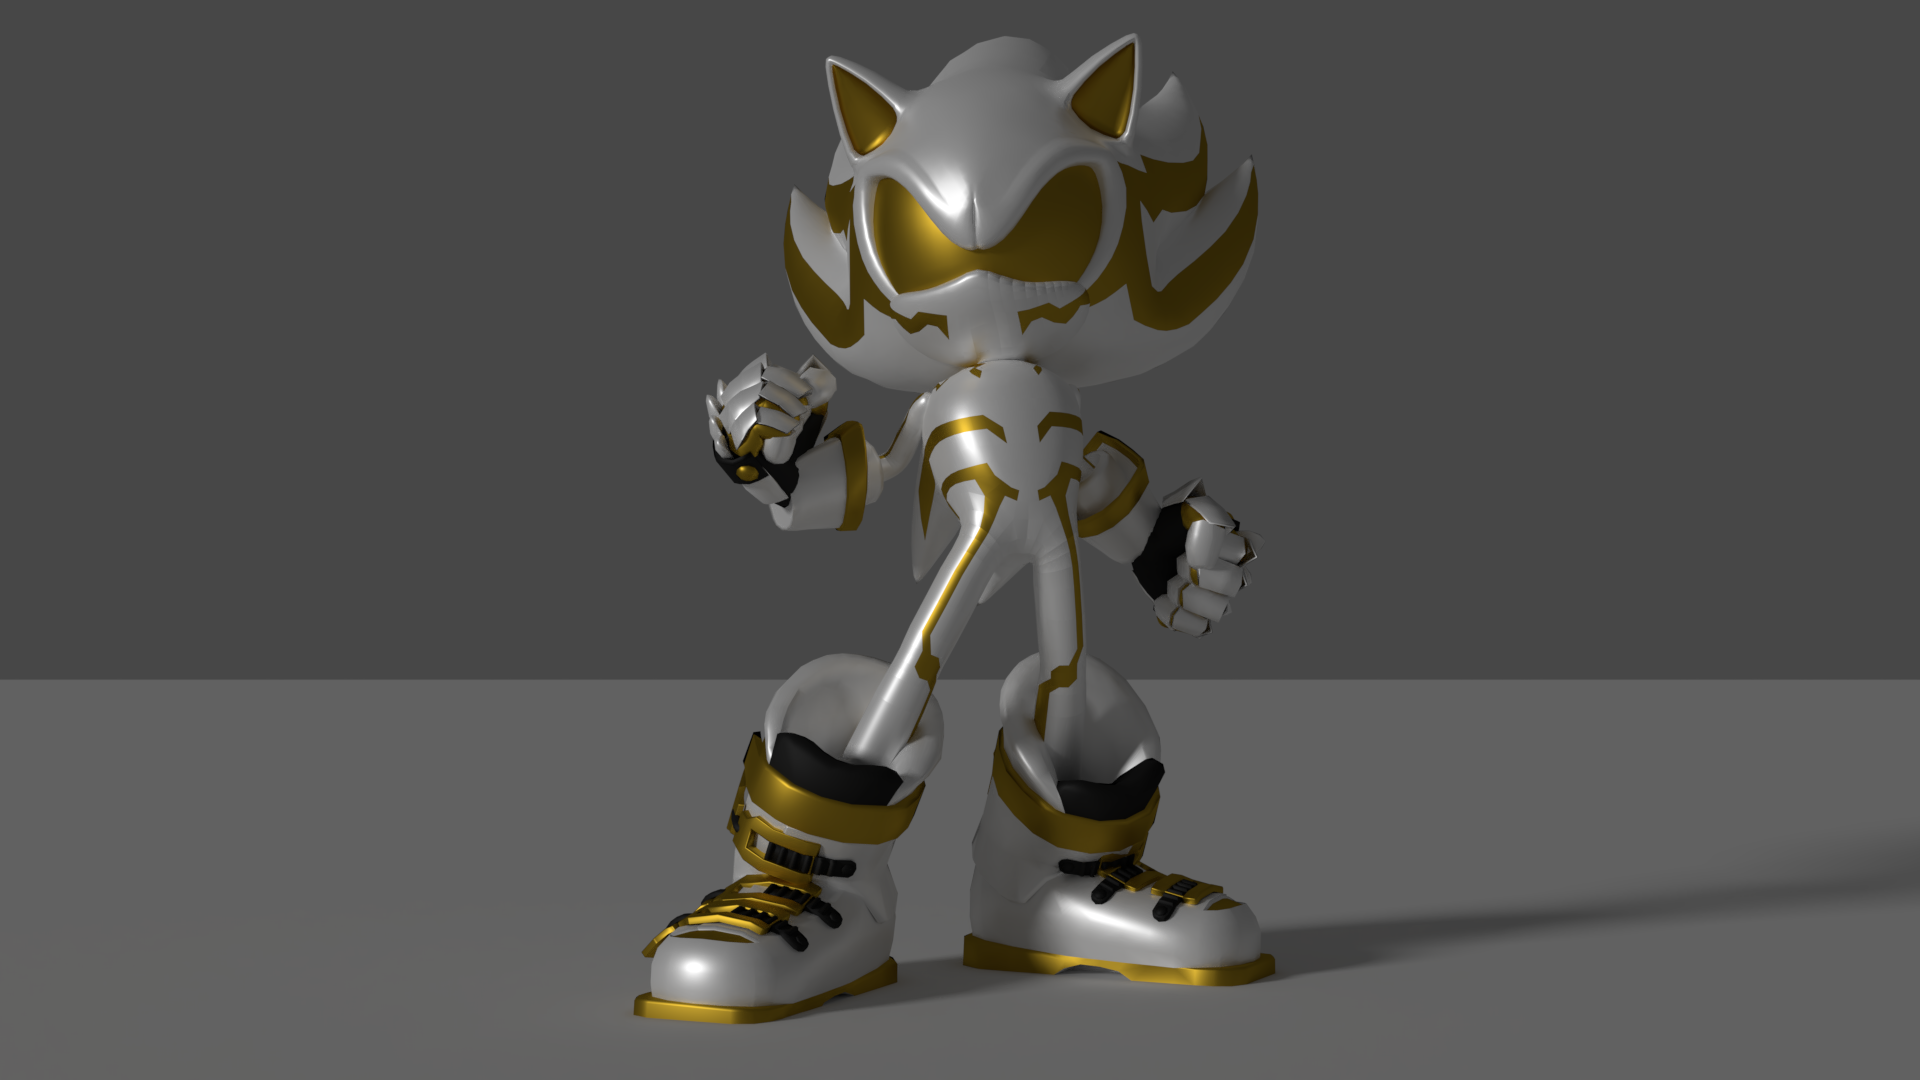 Sonic The Hedgehog: GOTTA GO FAST!